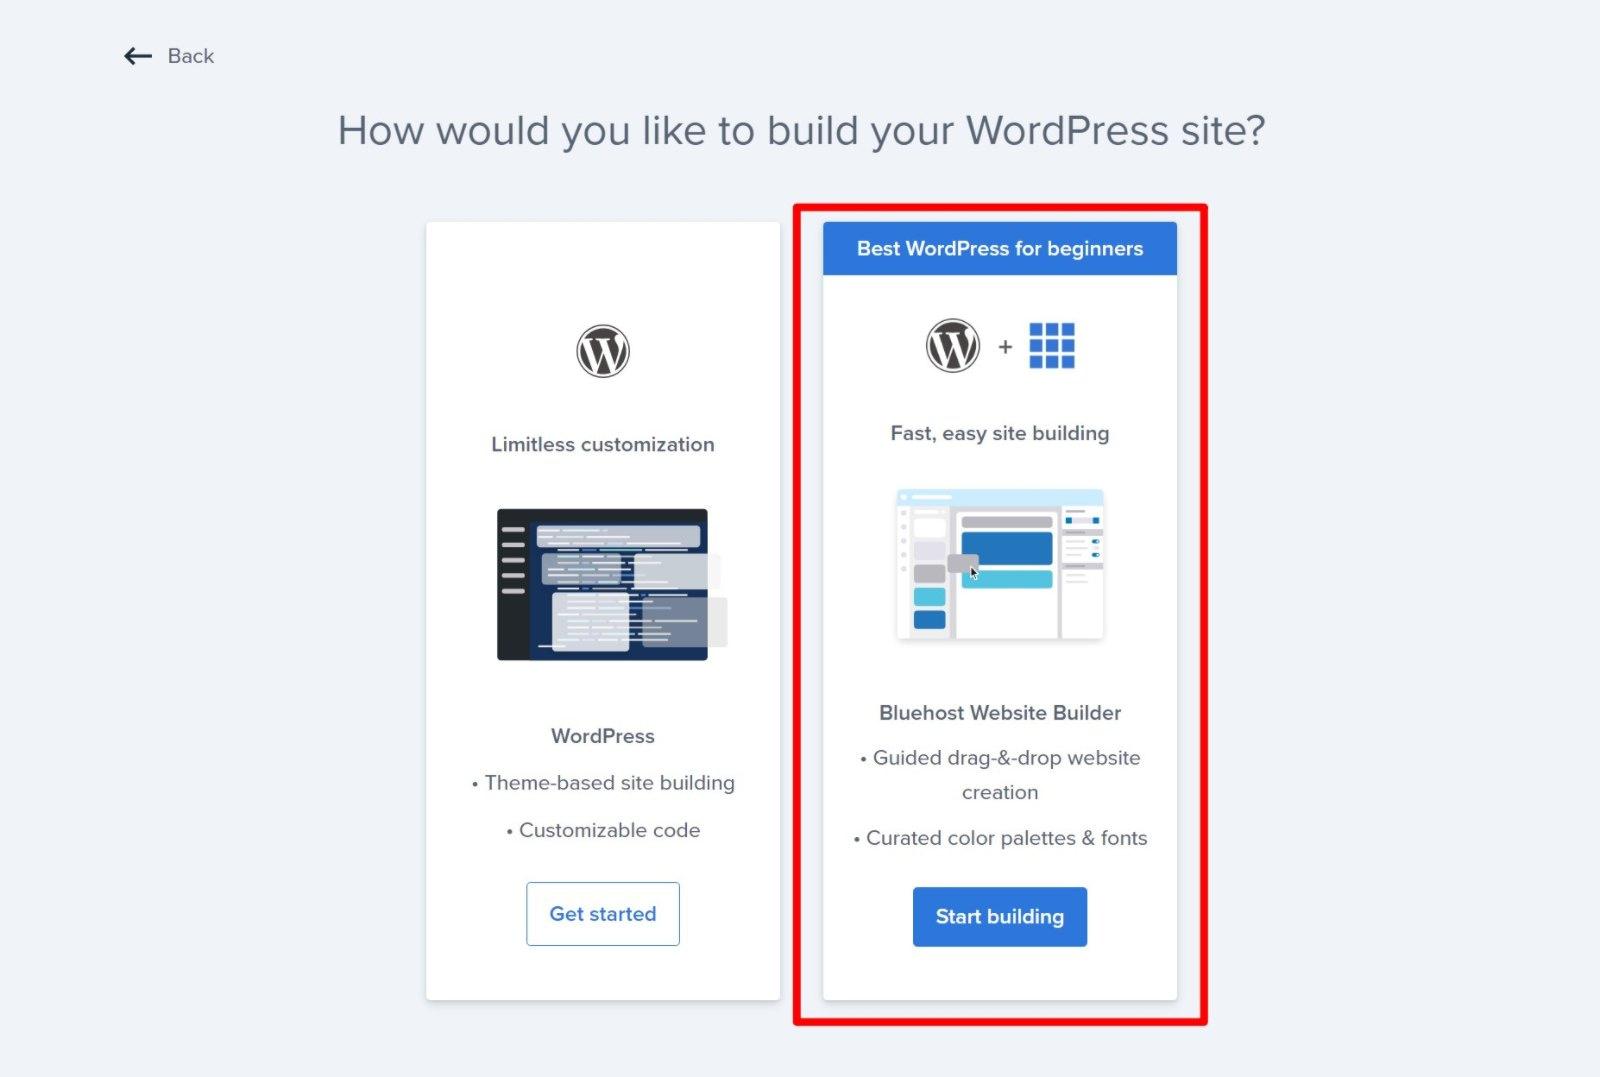 Choose the Bluehost Website Builder